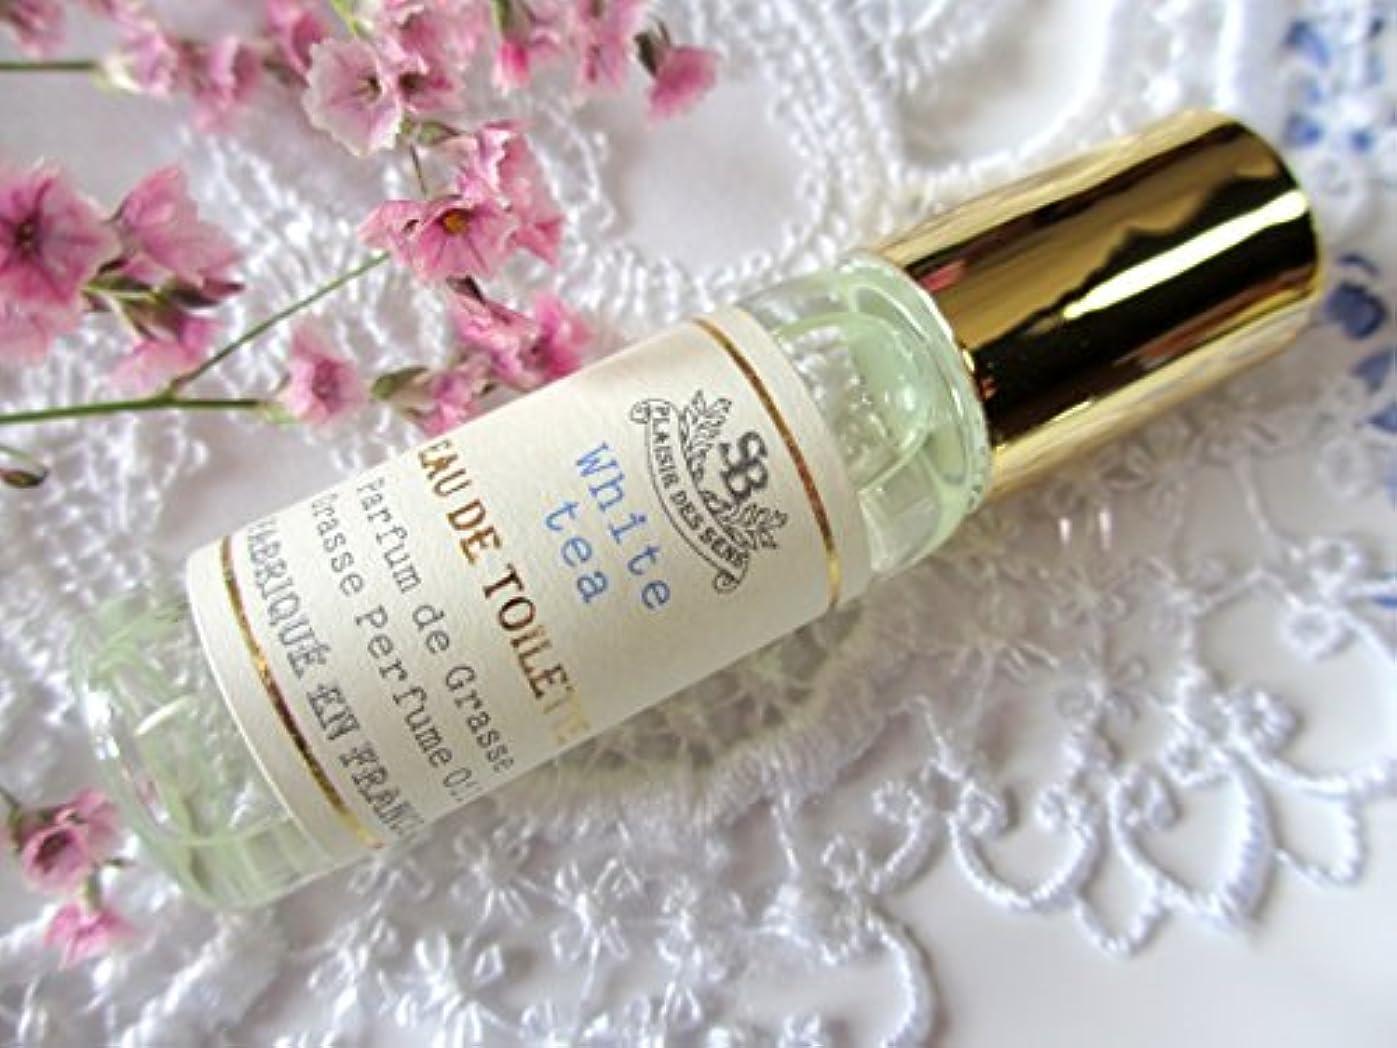 Senteur et Beaute(サンタールエボーテ) フレンチクラシックシリーズ プティトワレ ホワイトティー  ロールオン